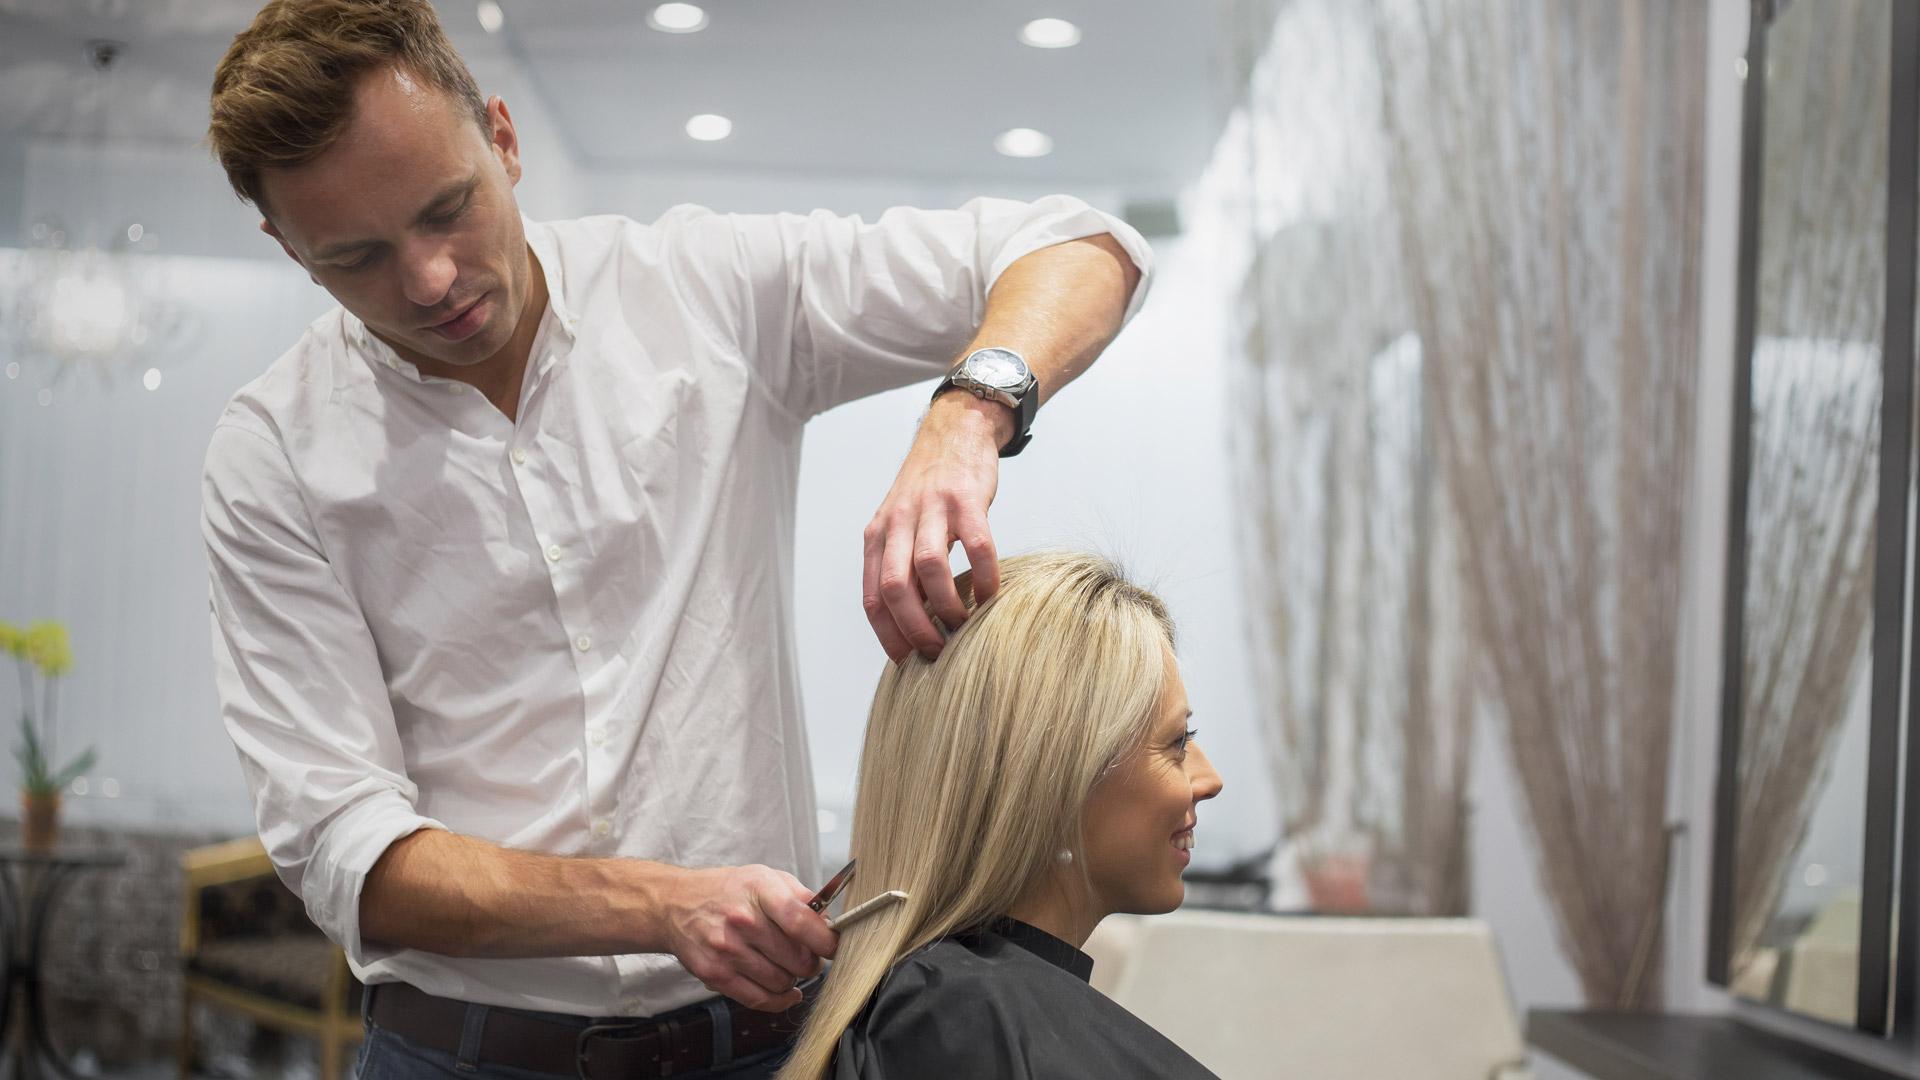 Hair Salon For Sale in Eastern Suburbs - Net Profit of $500k Per Annum